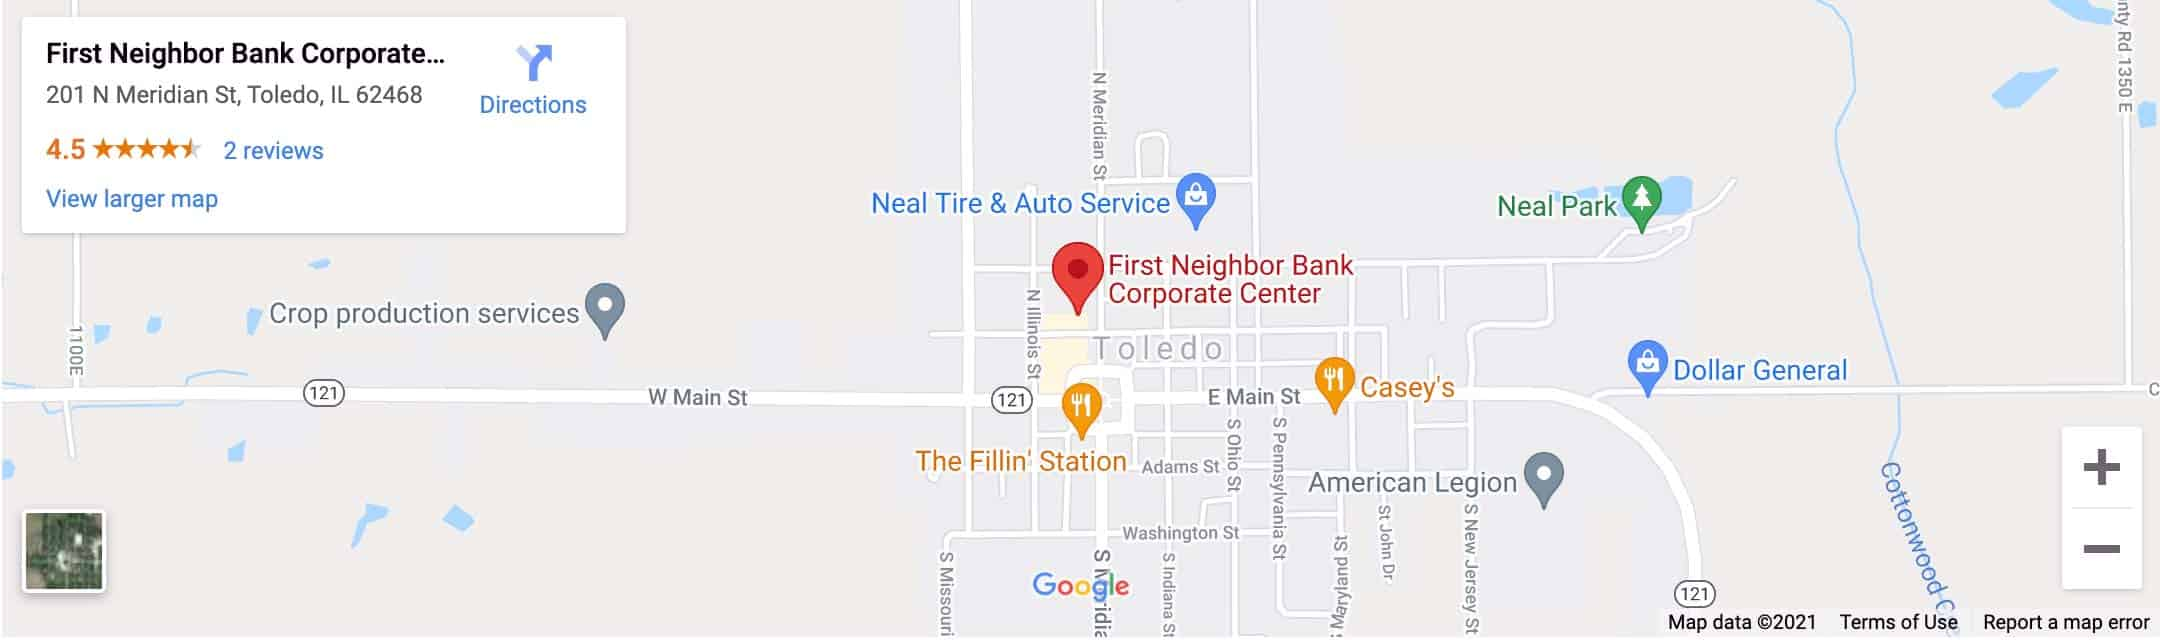 Decorative - FNB Corporate Center Google Map Image